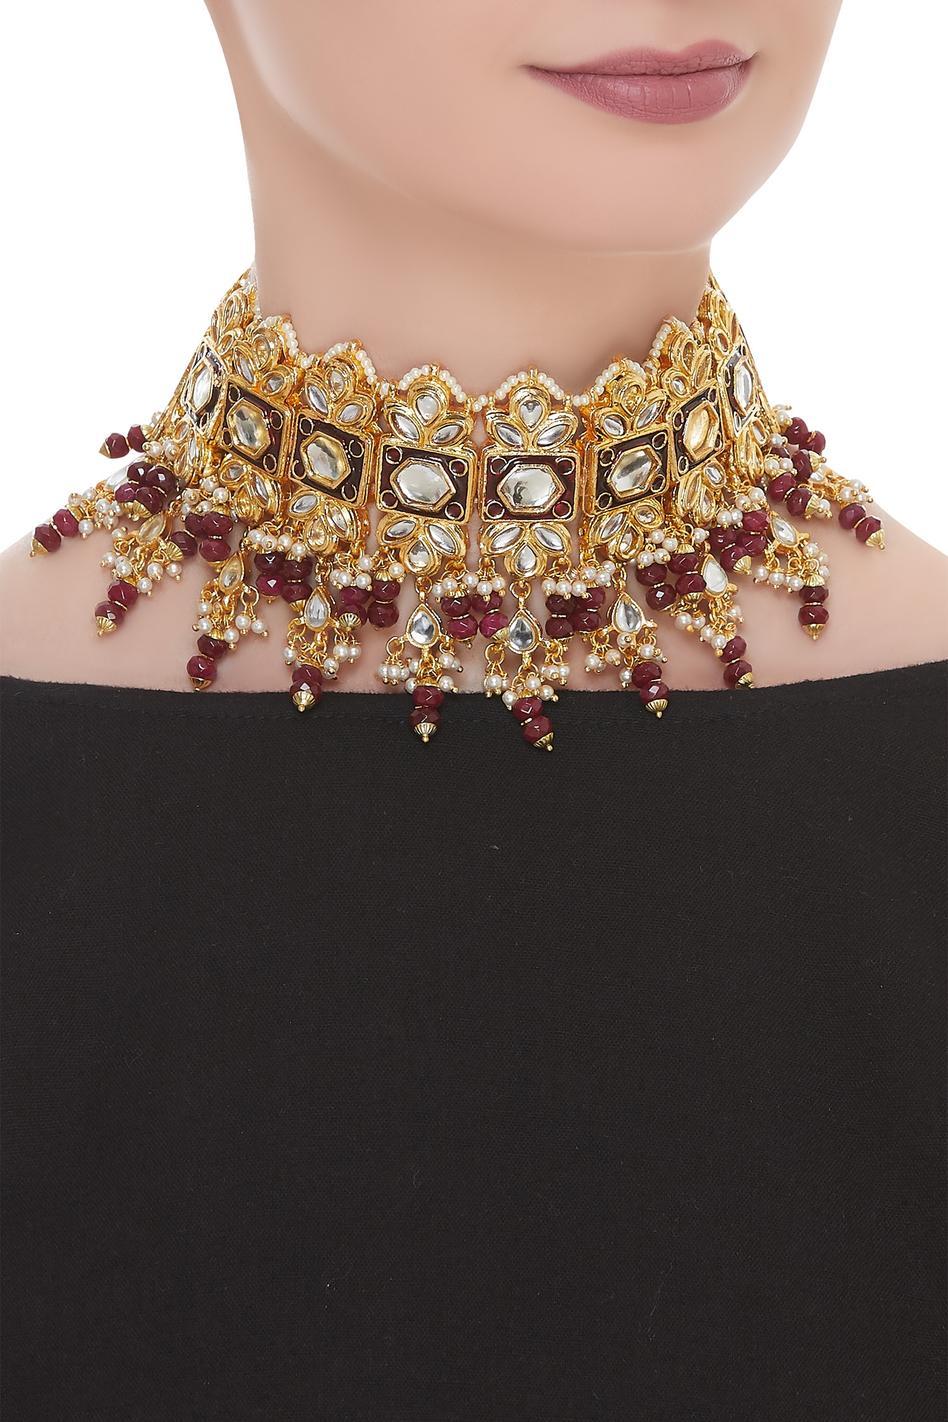 Jadtar Choker Necklace